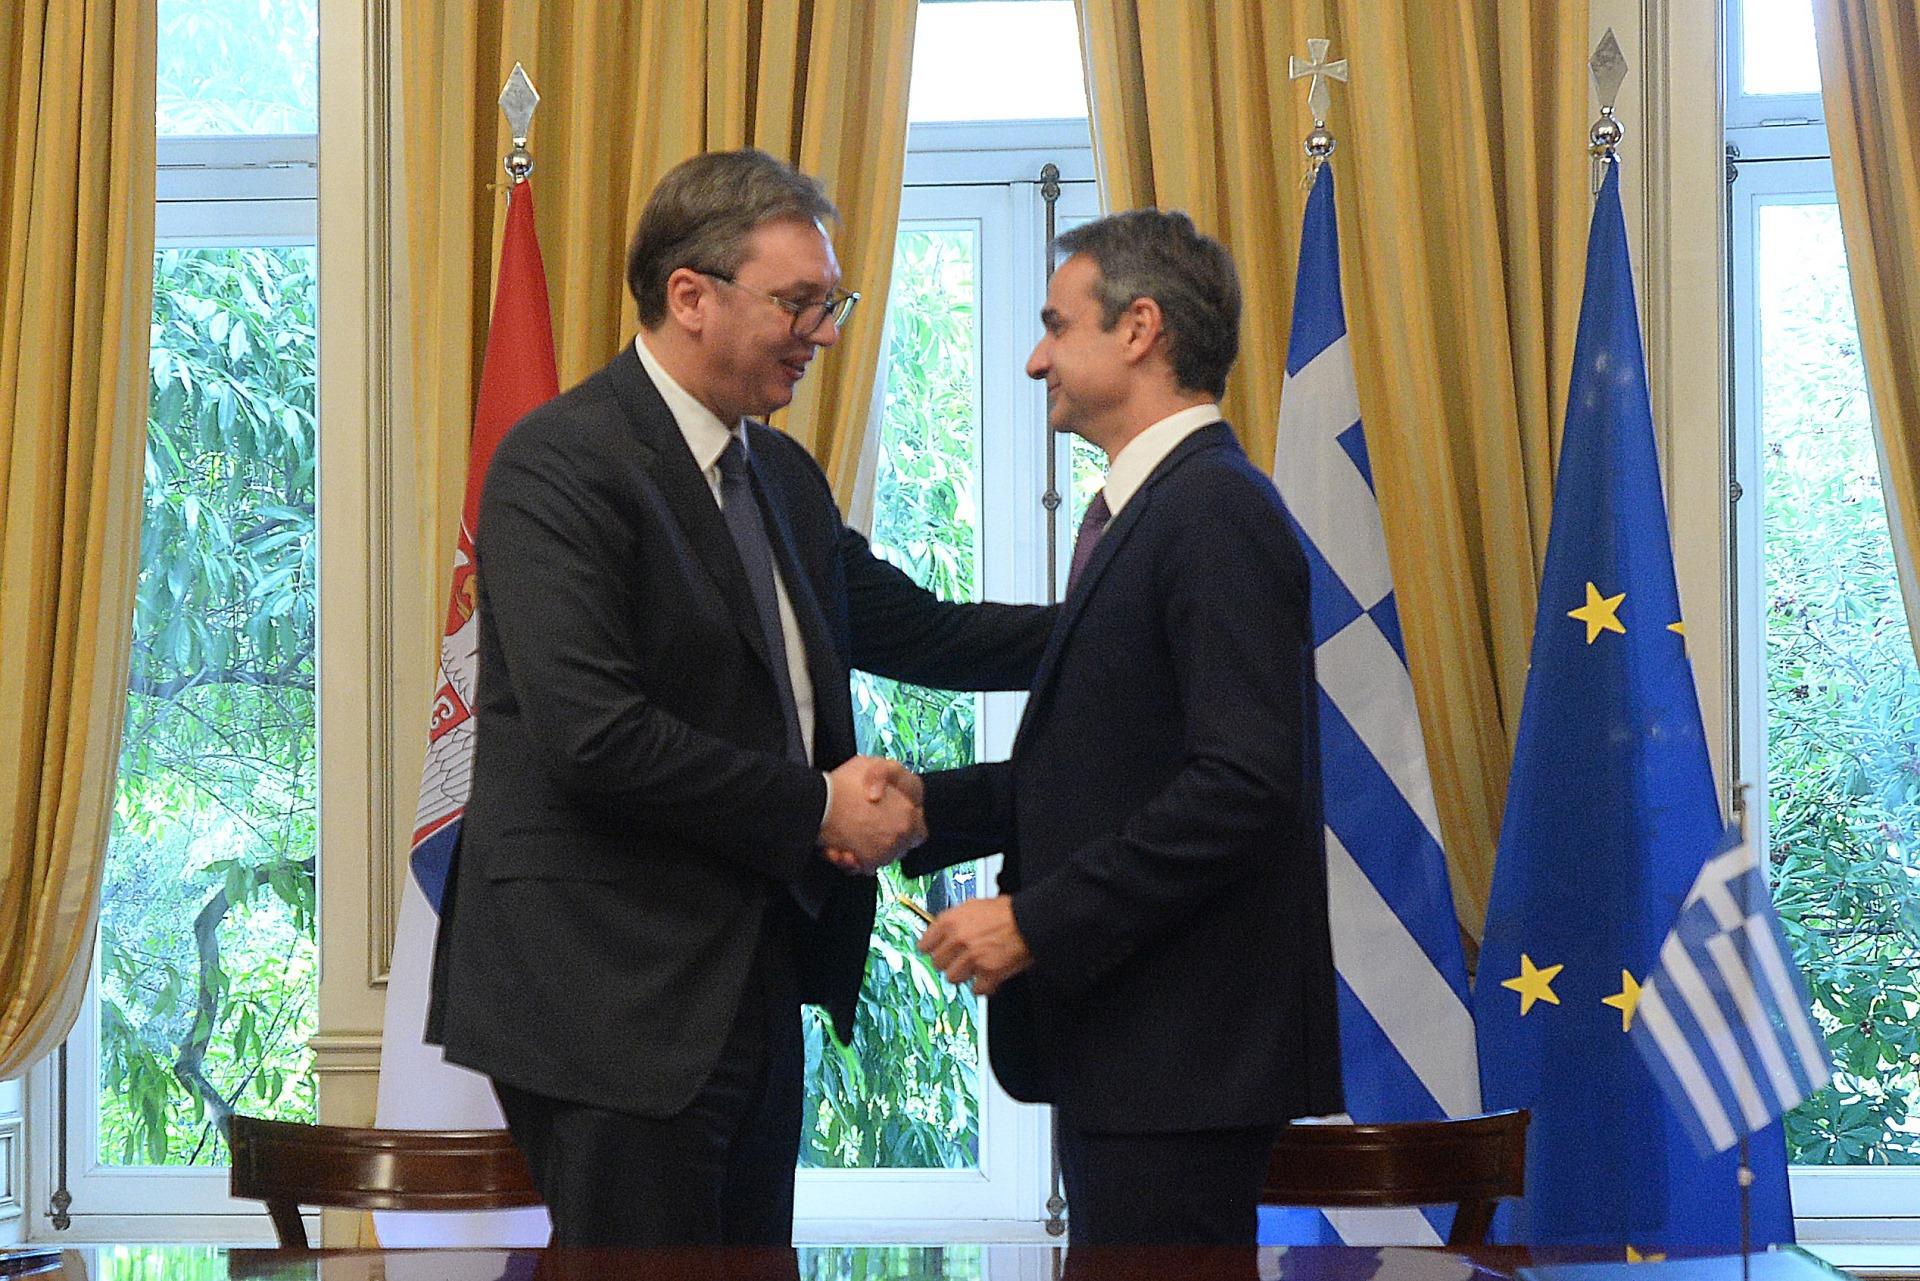 Predsednik Srbije Aleksandar Vucic sa grčkim premijerom Kirjakosom Micotakisom 4